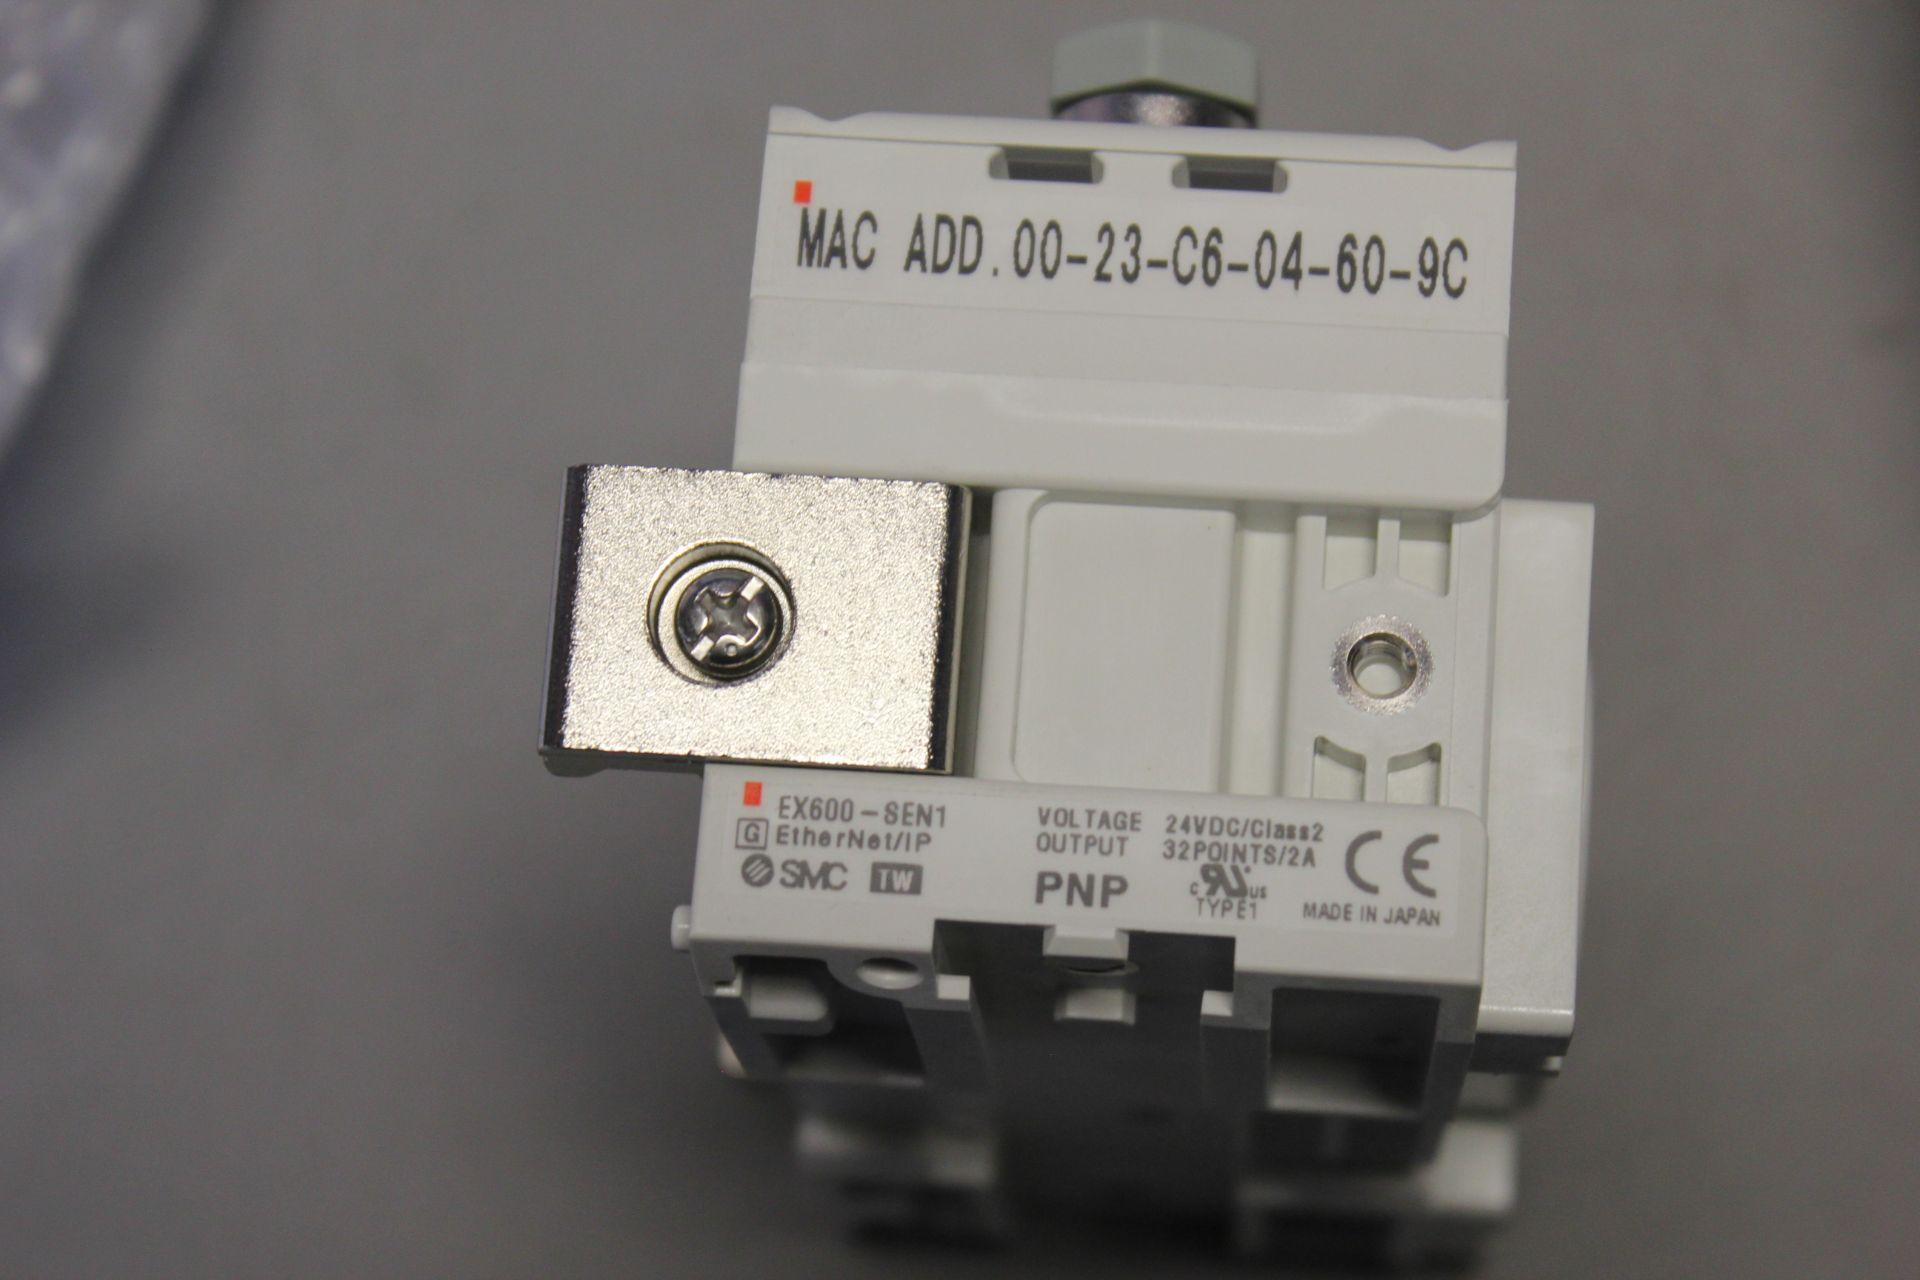 NEW SMC ETHERNET/IP MODULE - Image 3 of 4